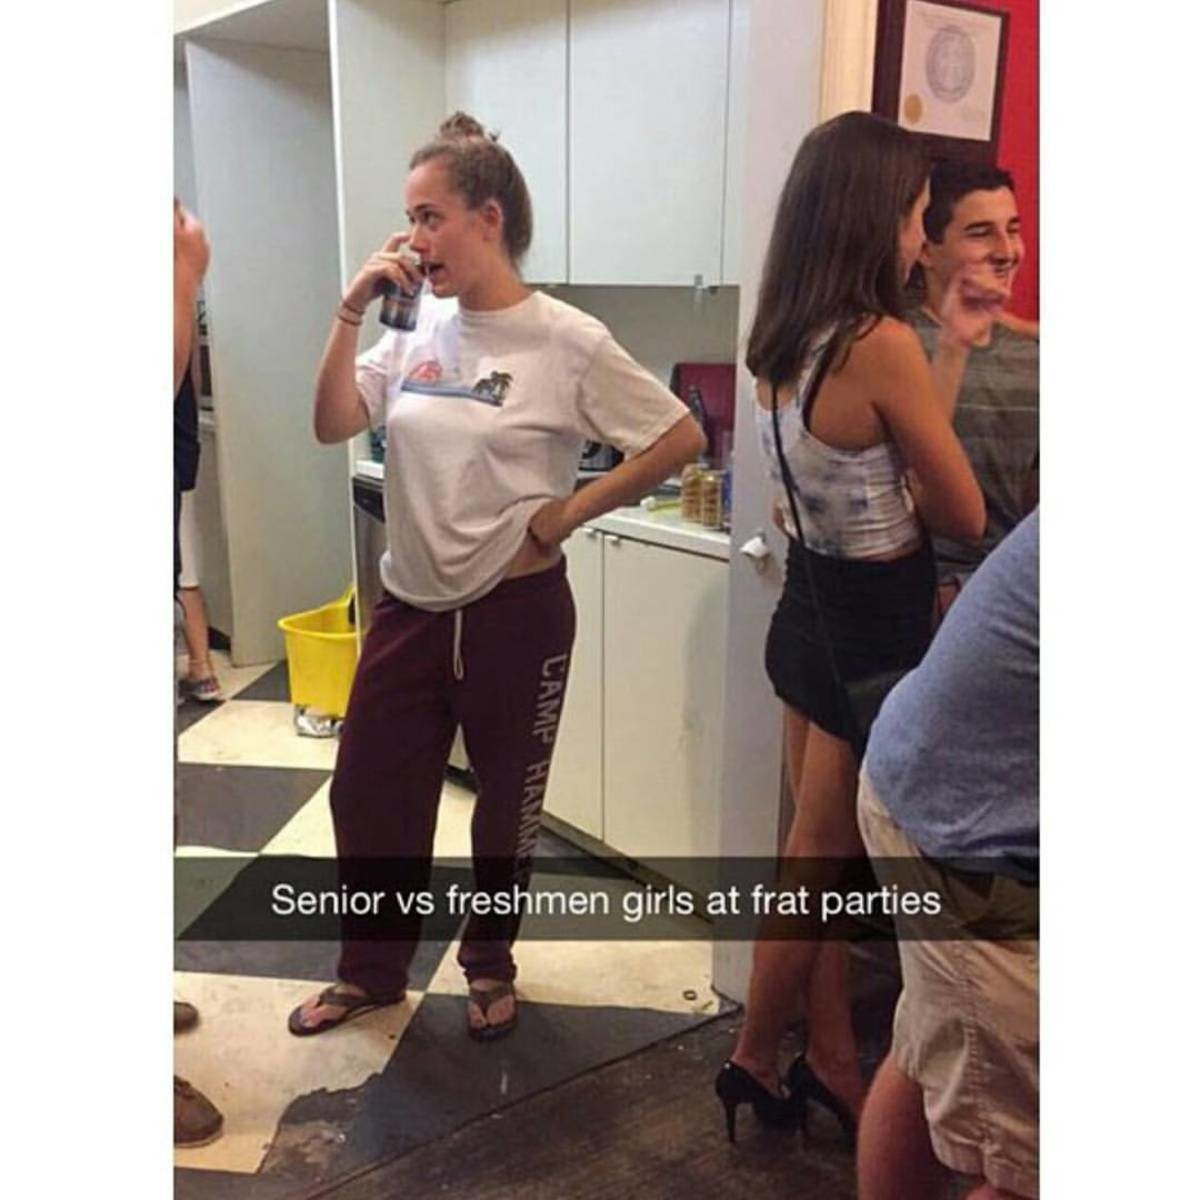 evasive noiseless Mink. . Senior vs freshmen girls at frat parties. Man, girls in lazy outfits..